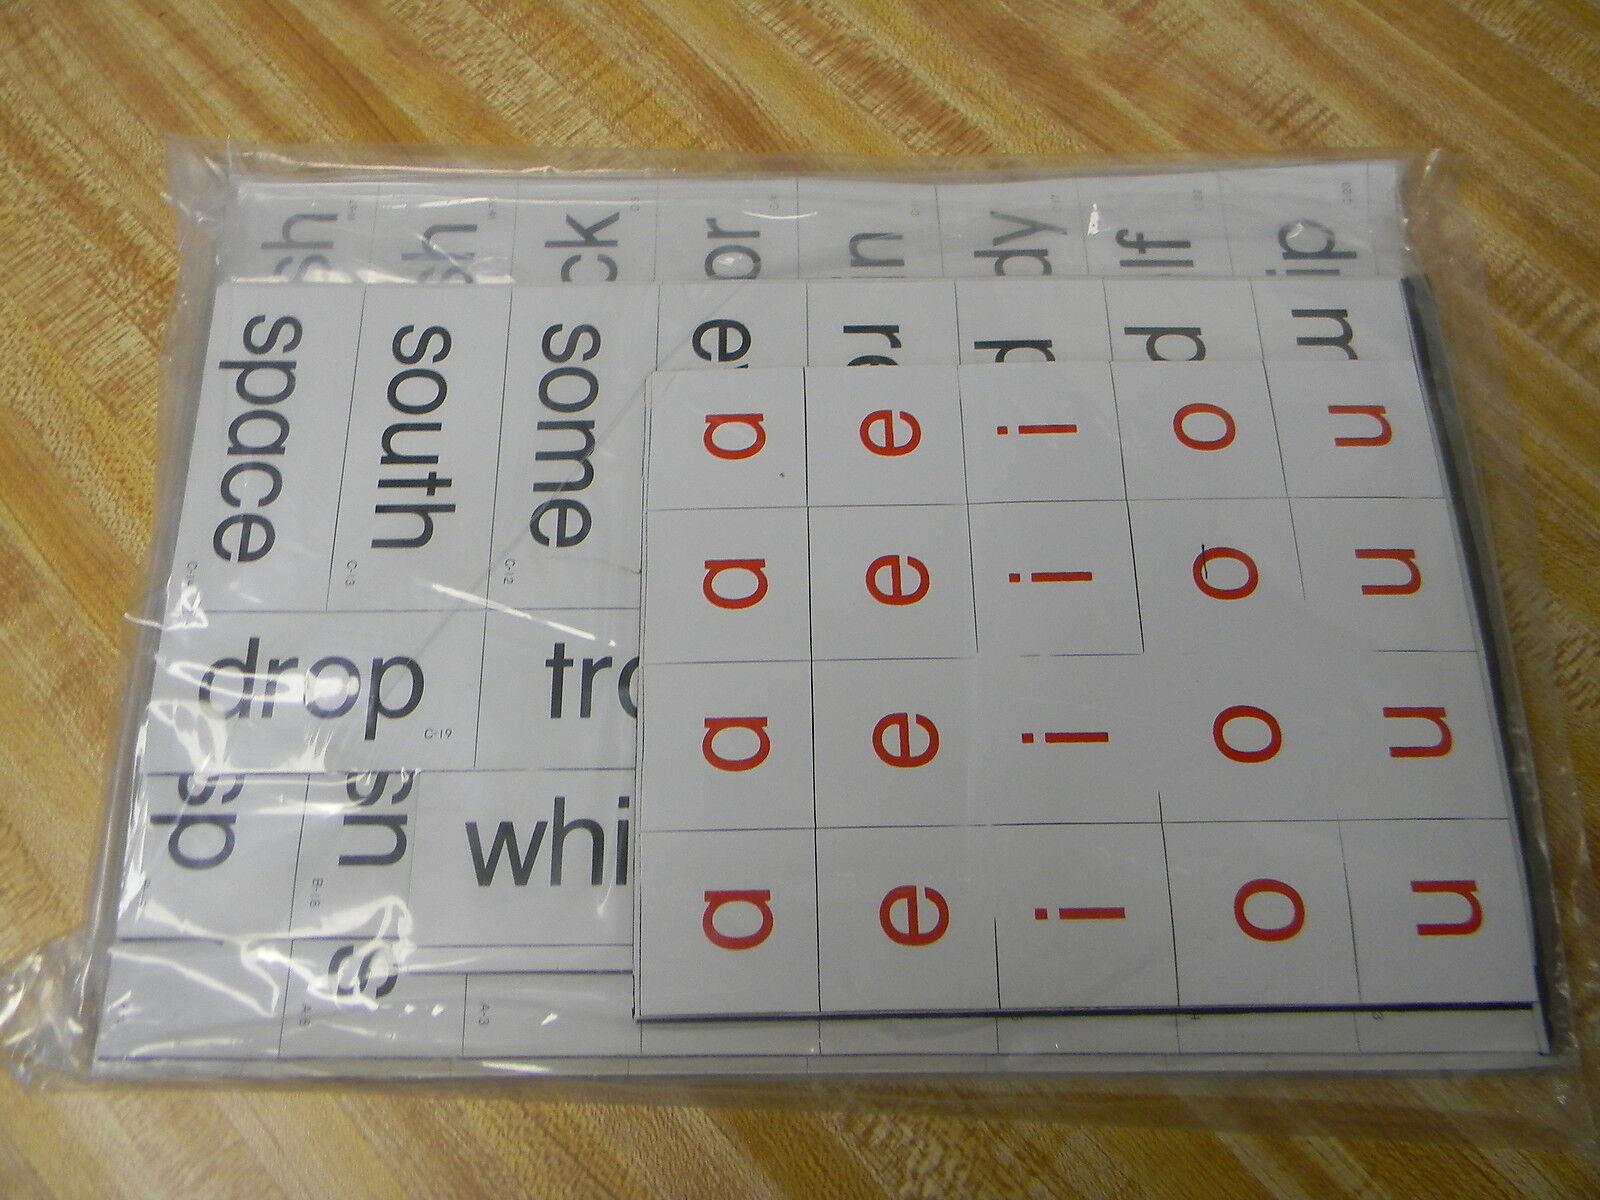 466 Magnetic Letters Words & Phonics Tiles Teachers Aid Spelling Sentence Making